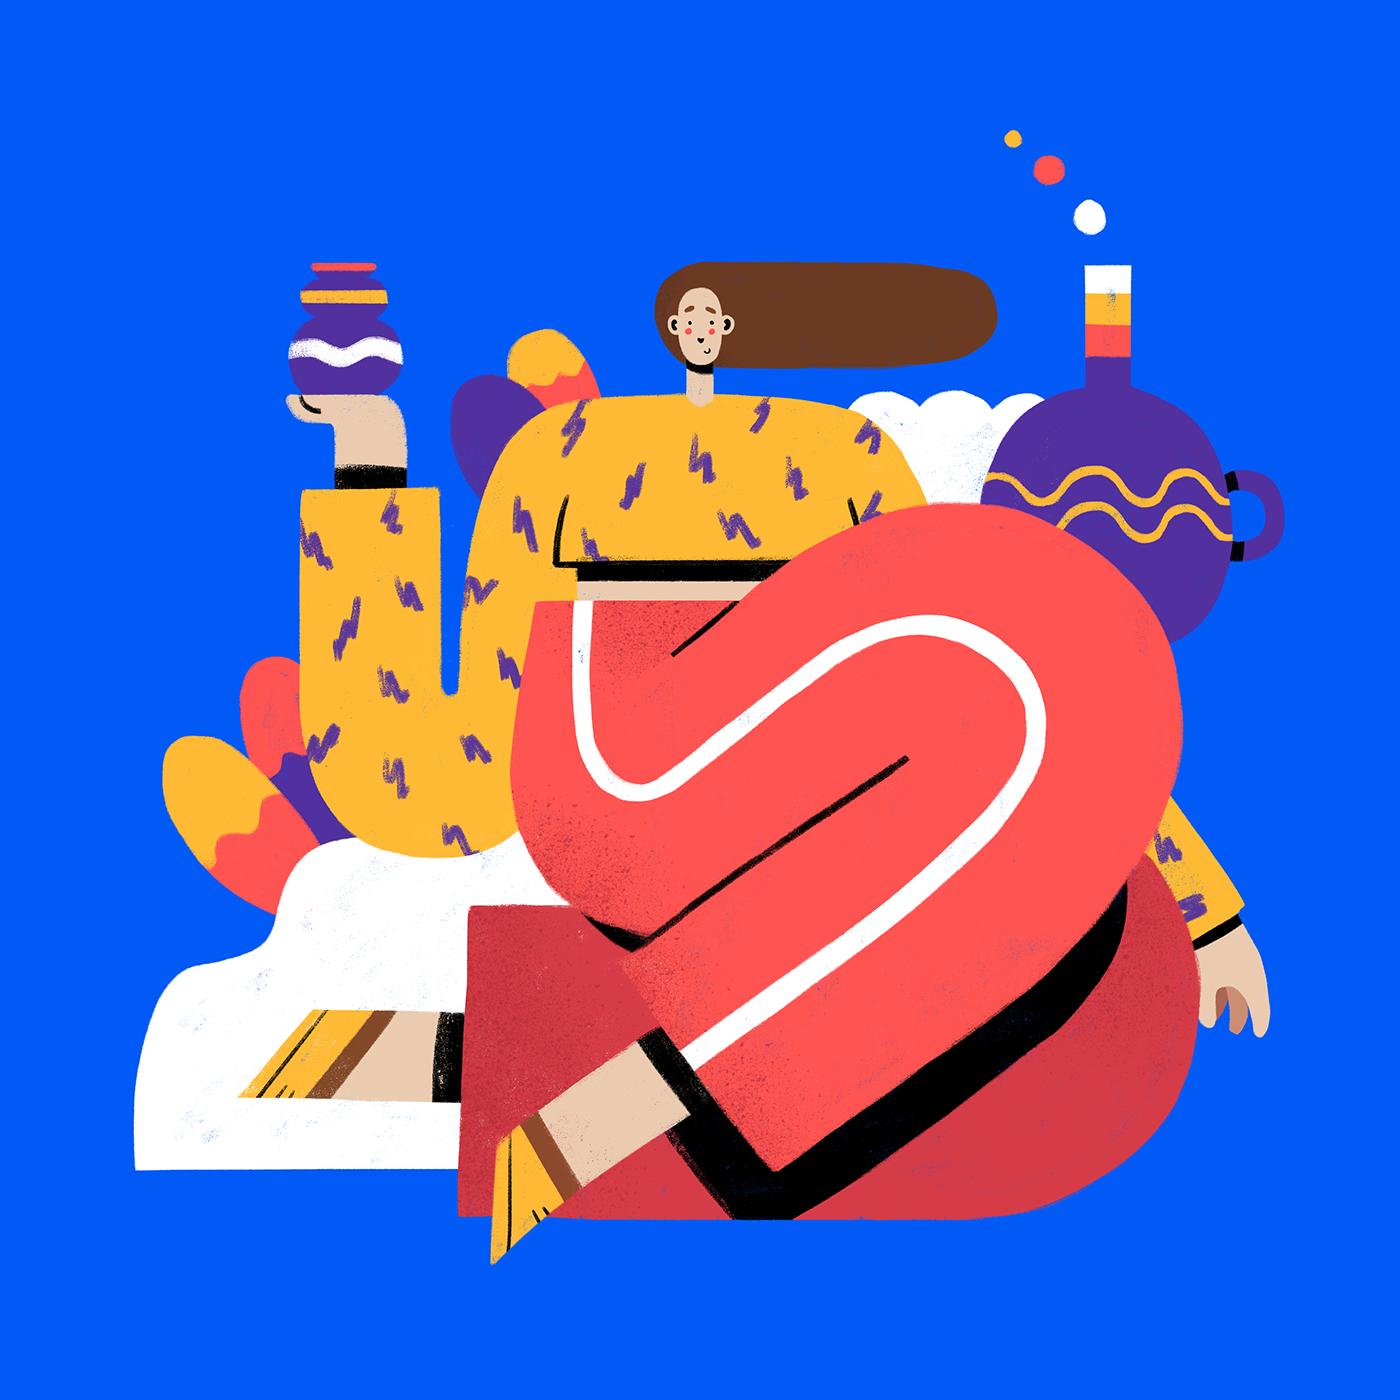 Lucas Wakamatsu on Behance Graphic design illustration